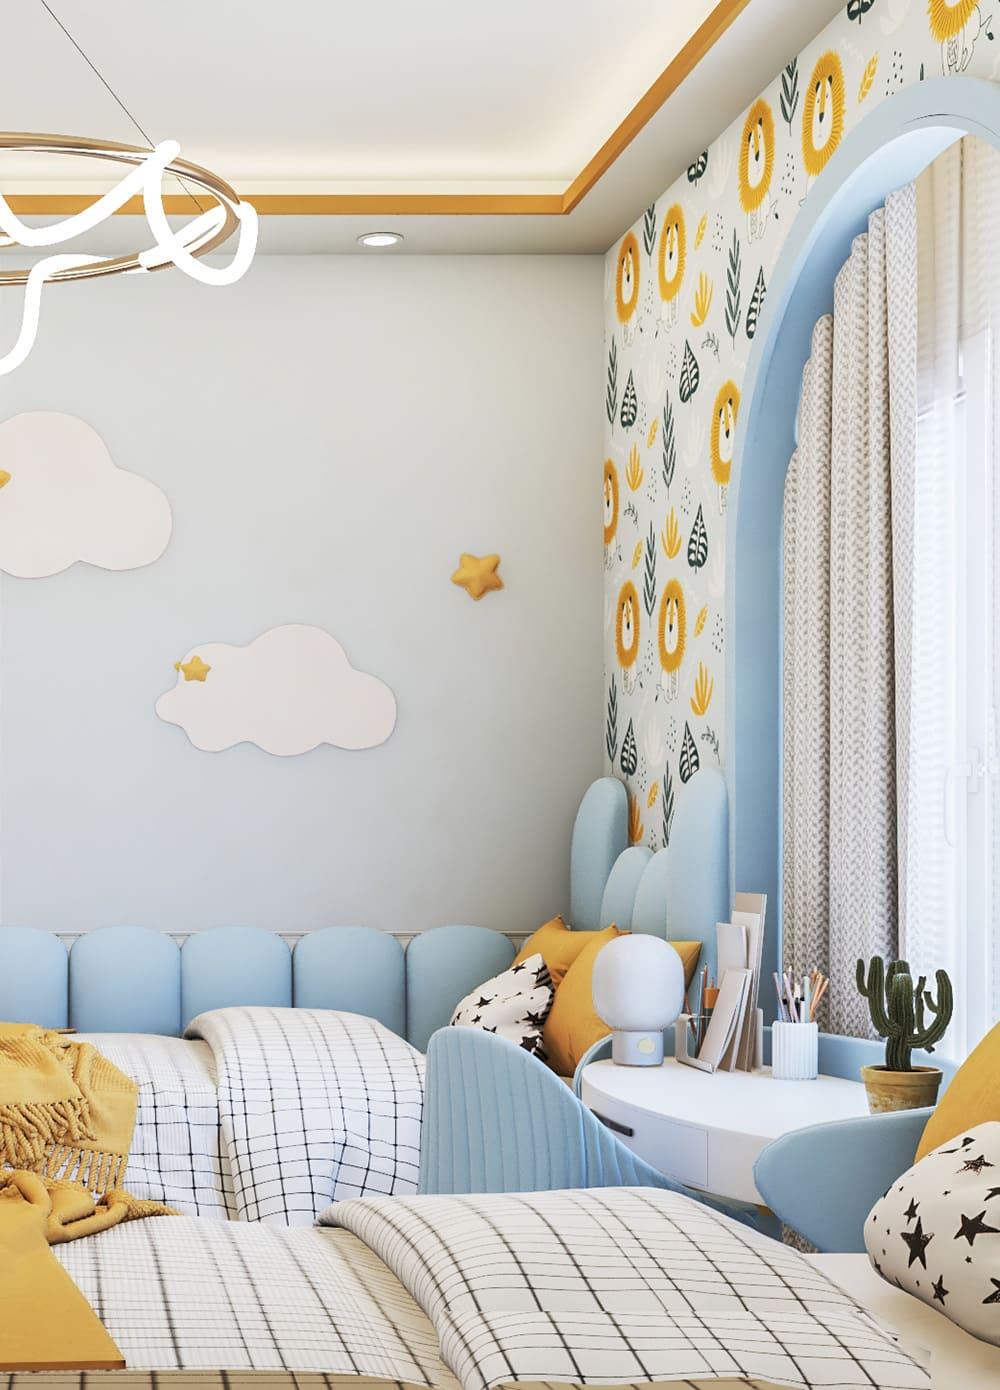 интерьер детской комнаты фото 55